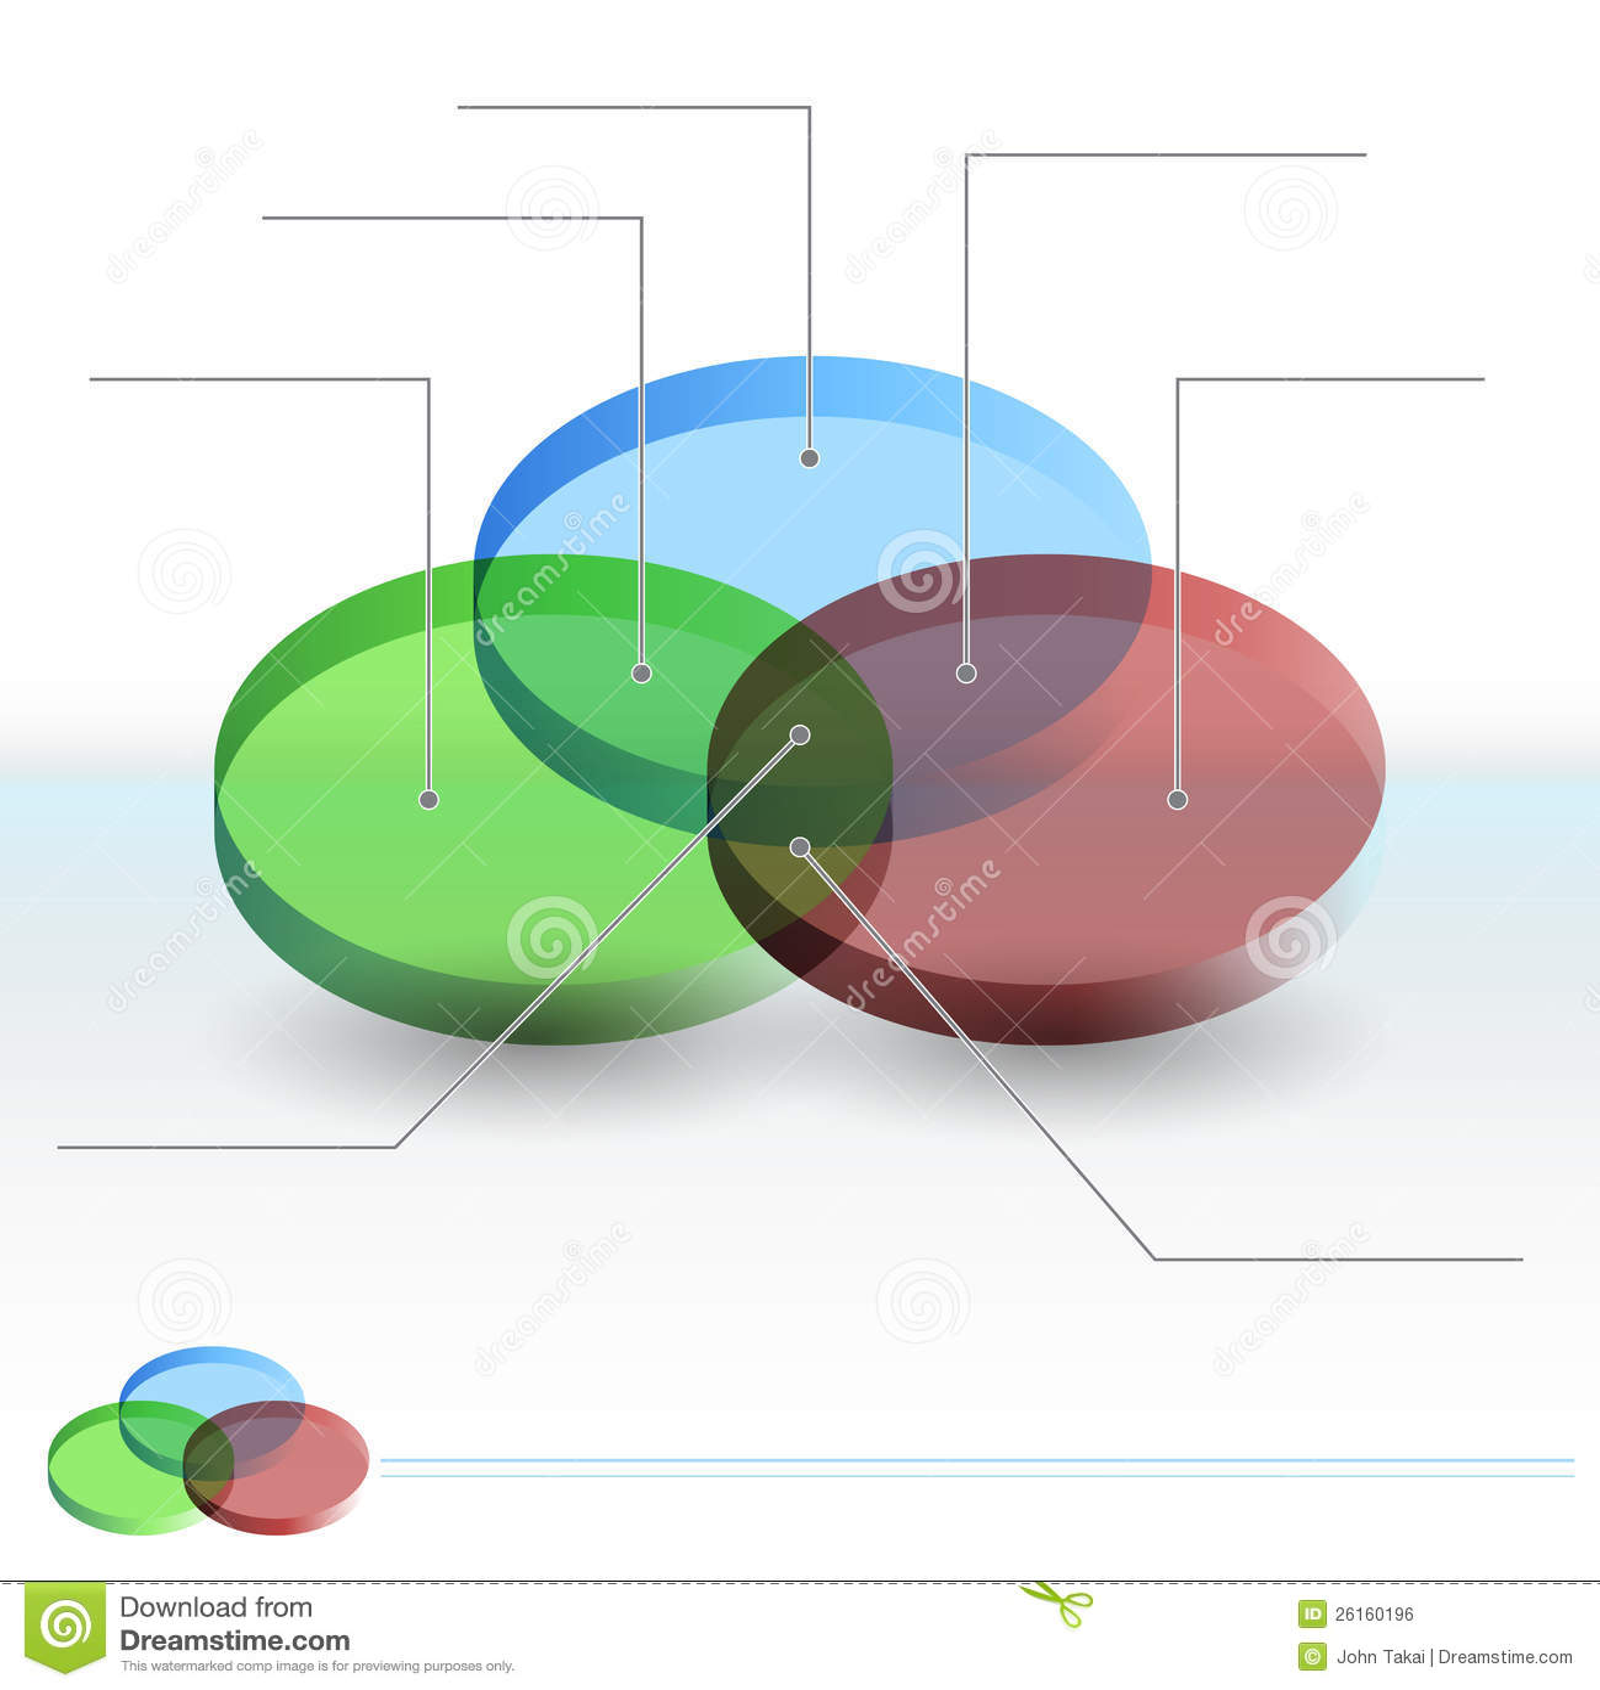 3d Venn Diagram Sections Stock Vector Image Of Green